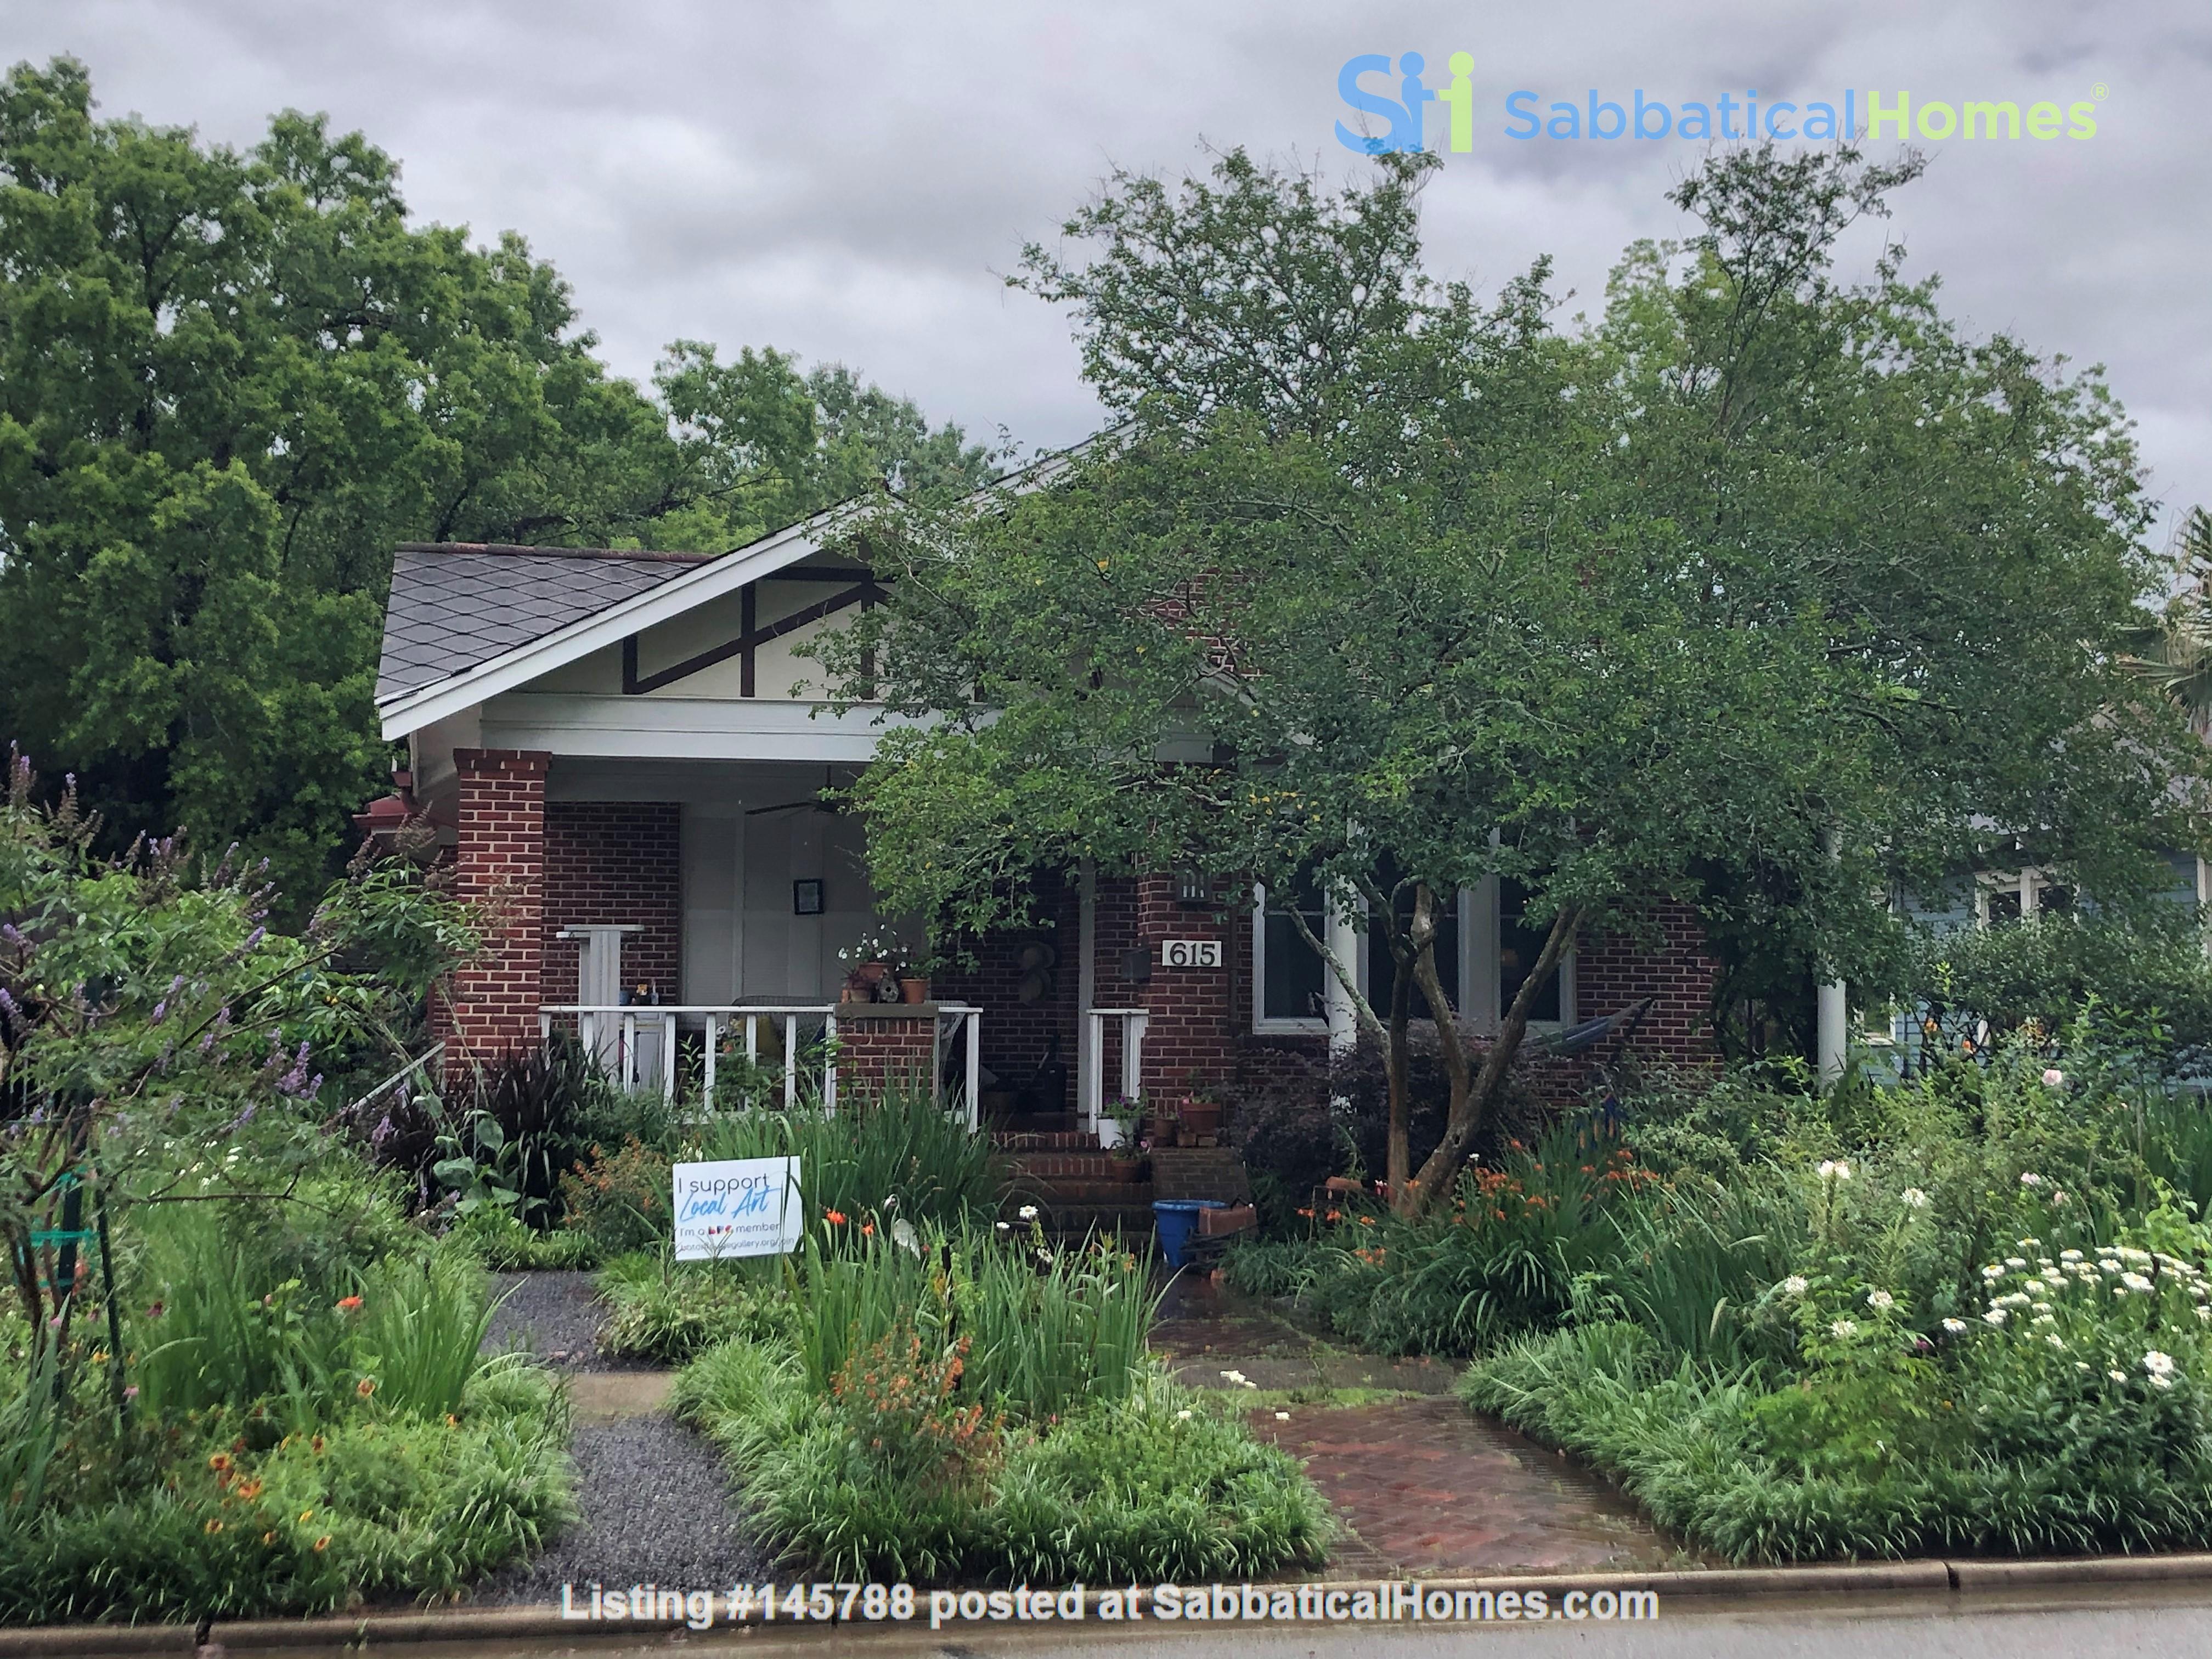 Charming 3 bedroom bungalow in Baton Rouge, Louisiana near LSU Home Rental in Baton Rouge 0